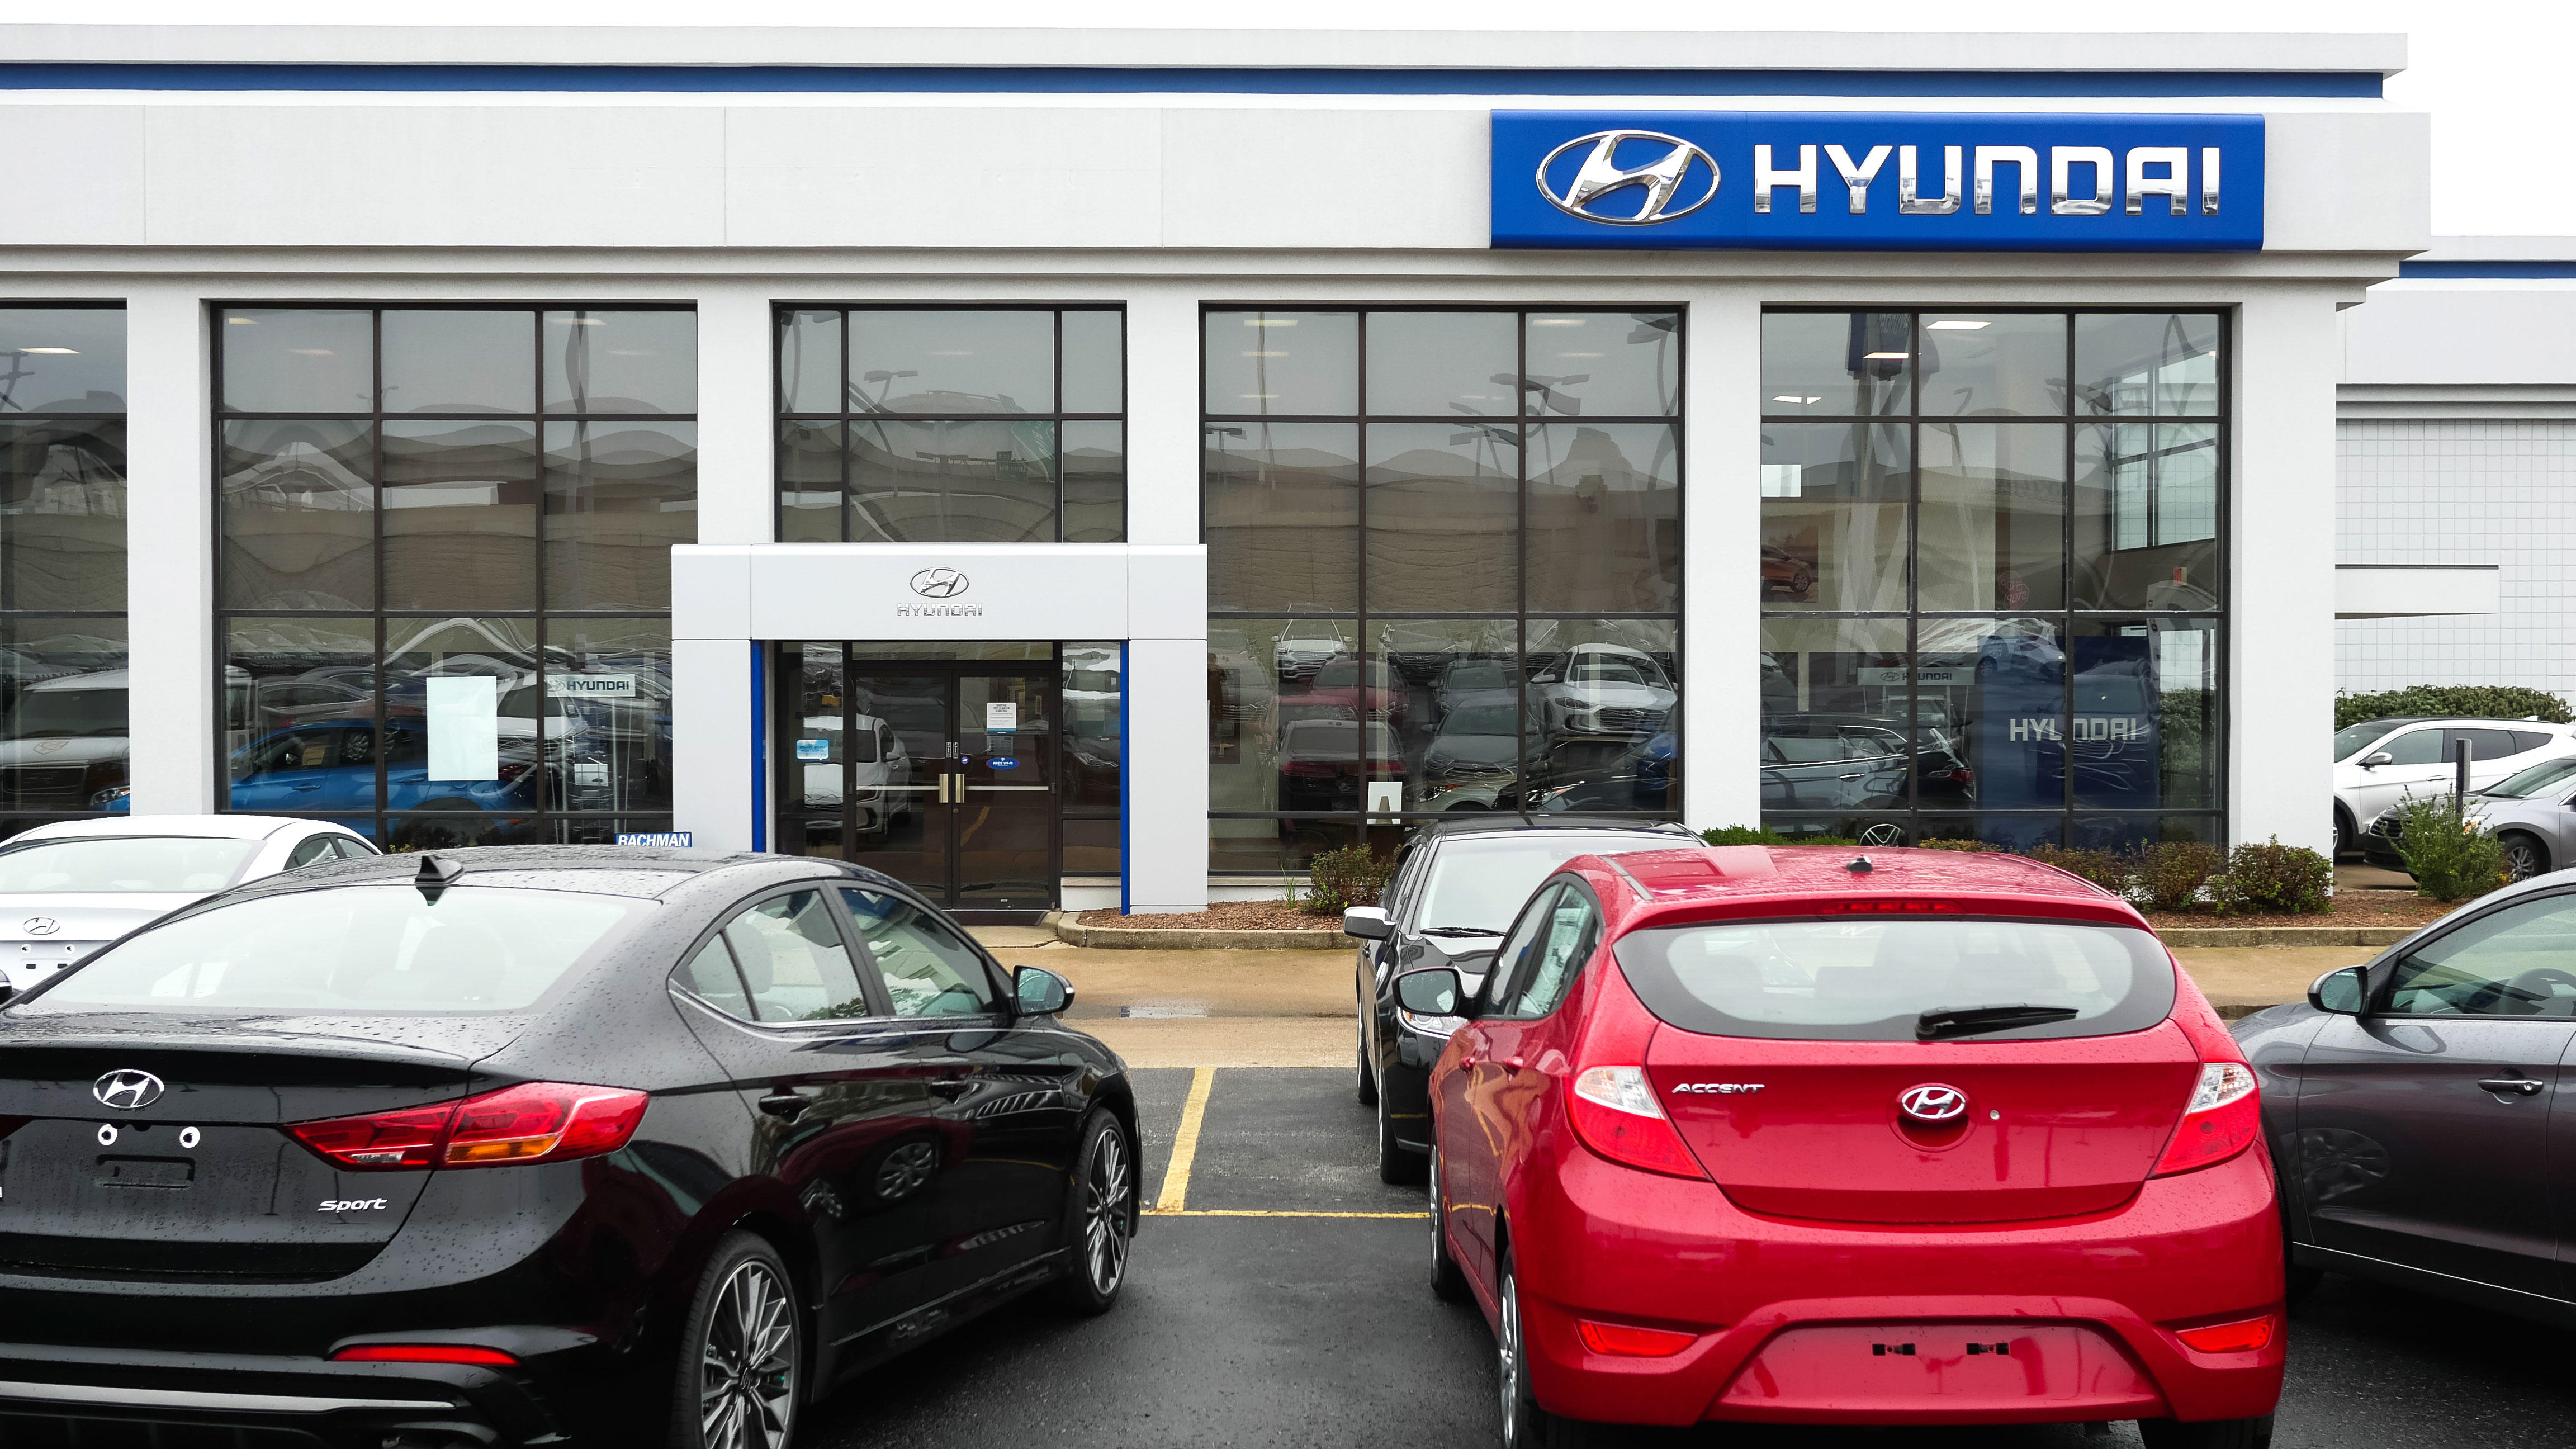 Bachman Hyundai image 1